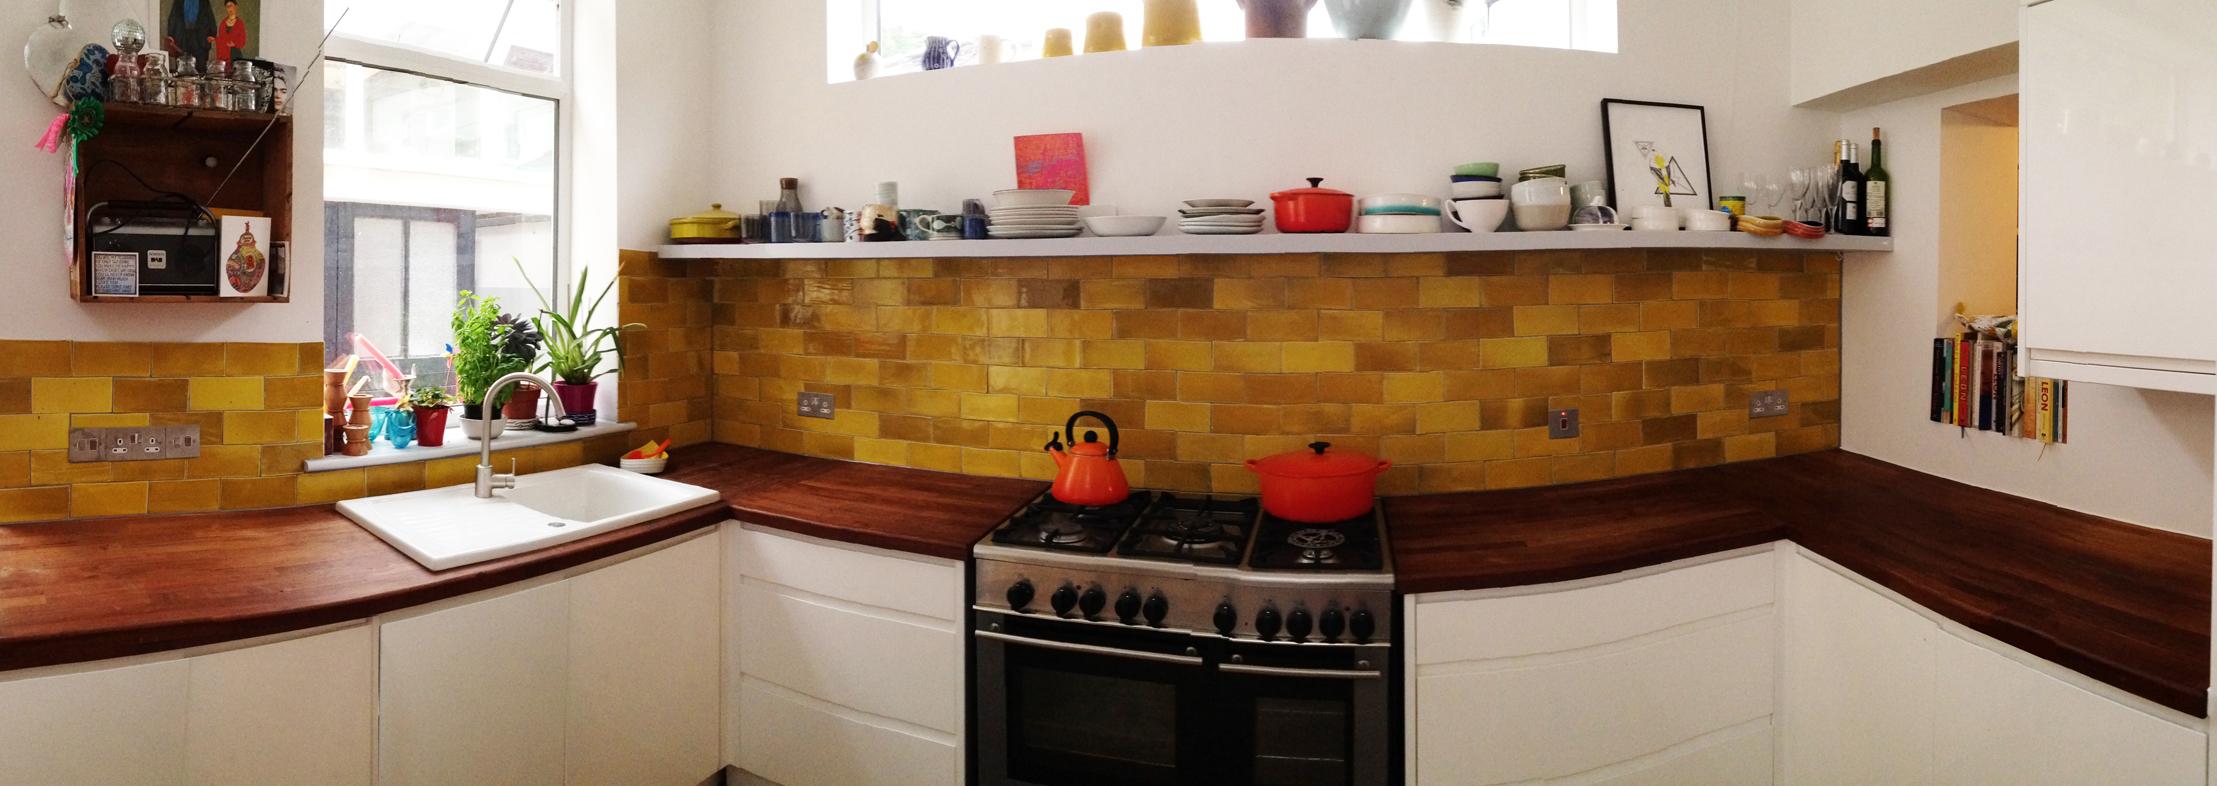 Bespoke kitchen tiles